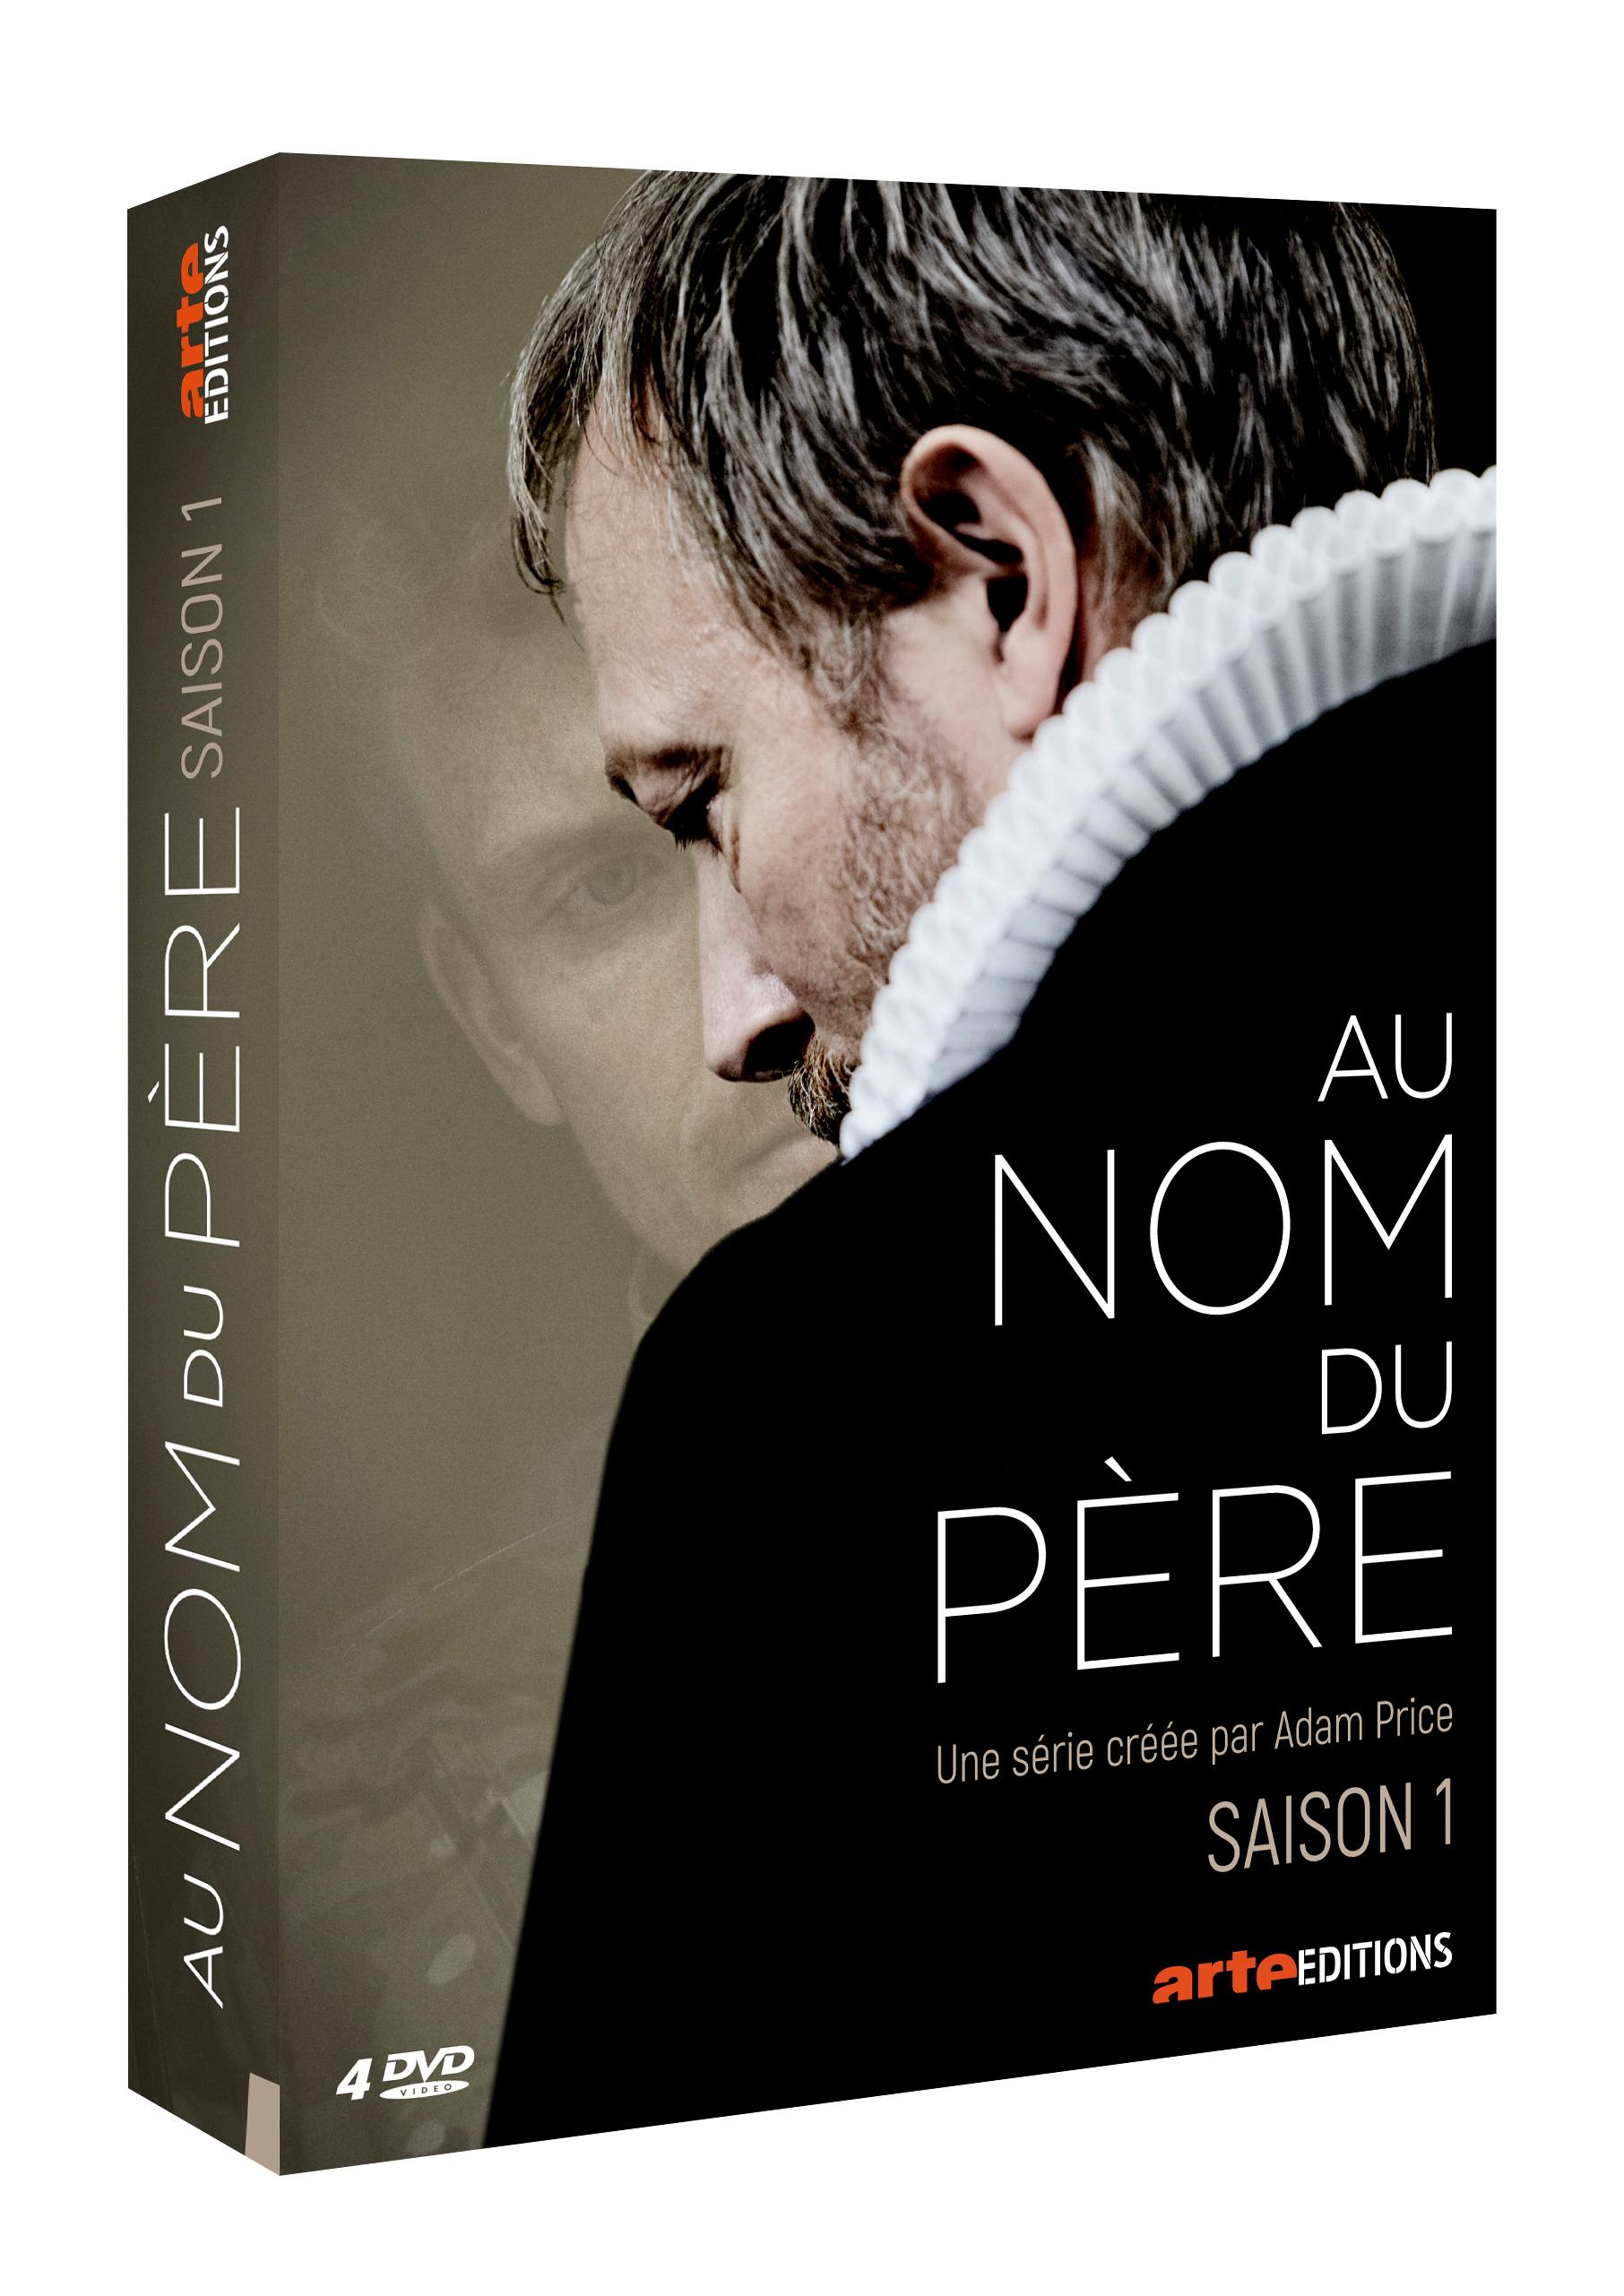 Au nom du pere - ride upon the storm s1 - 4 dvd